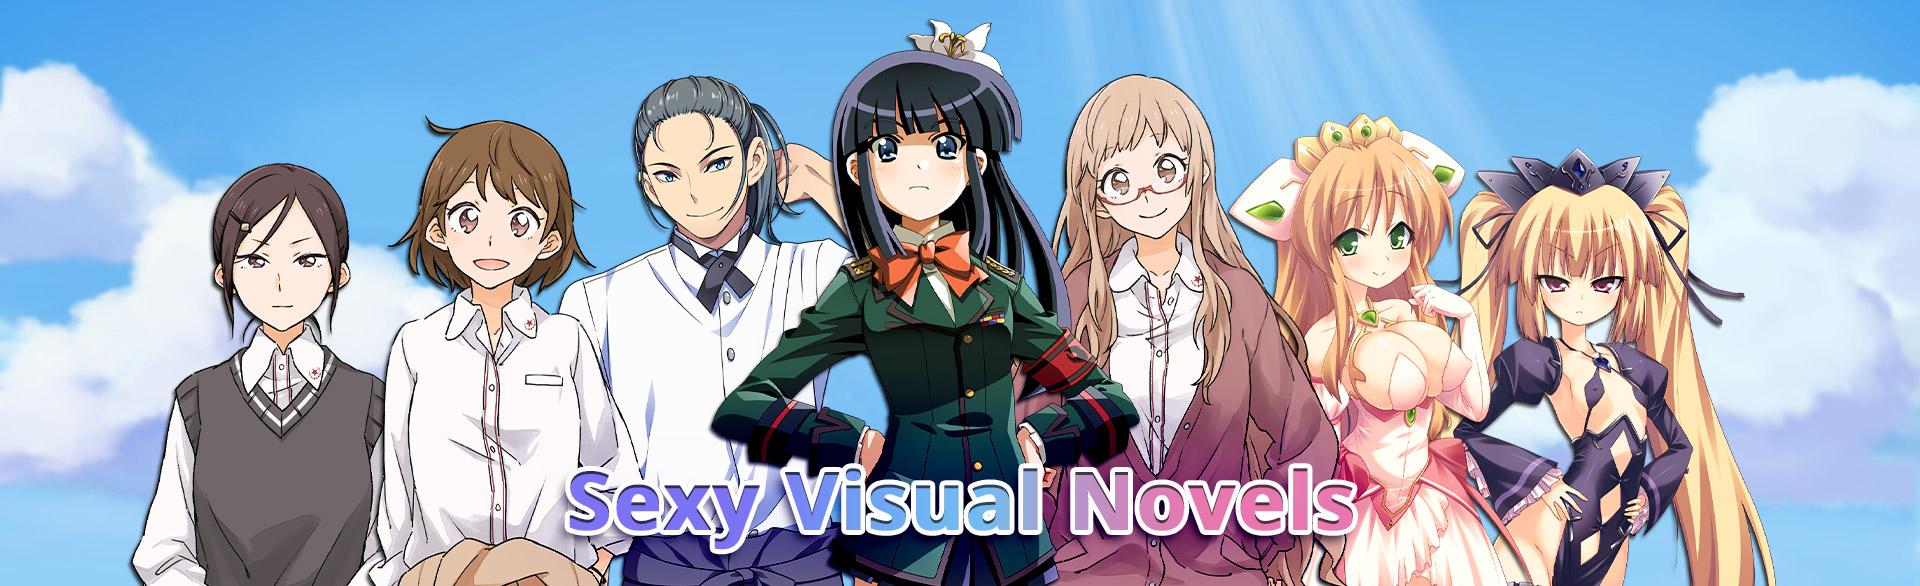 Sexy Visual Novel Hentai Games